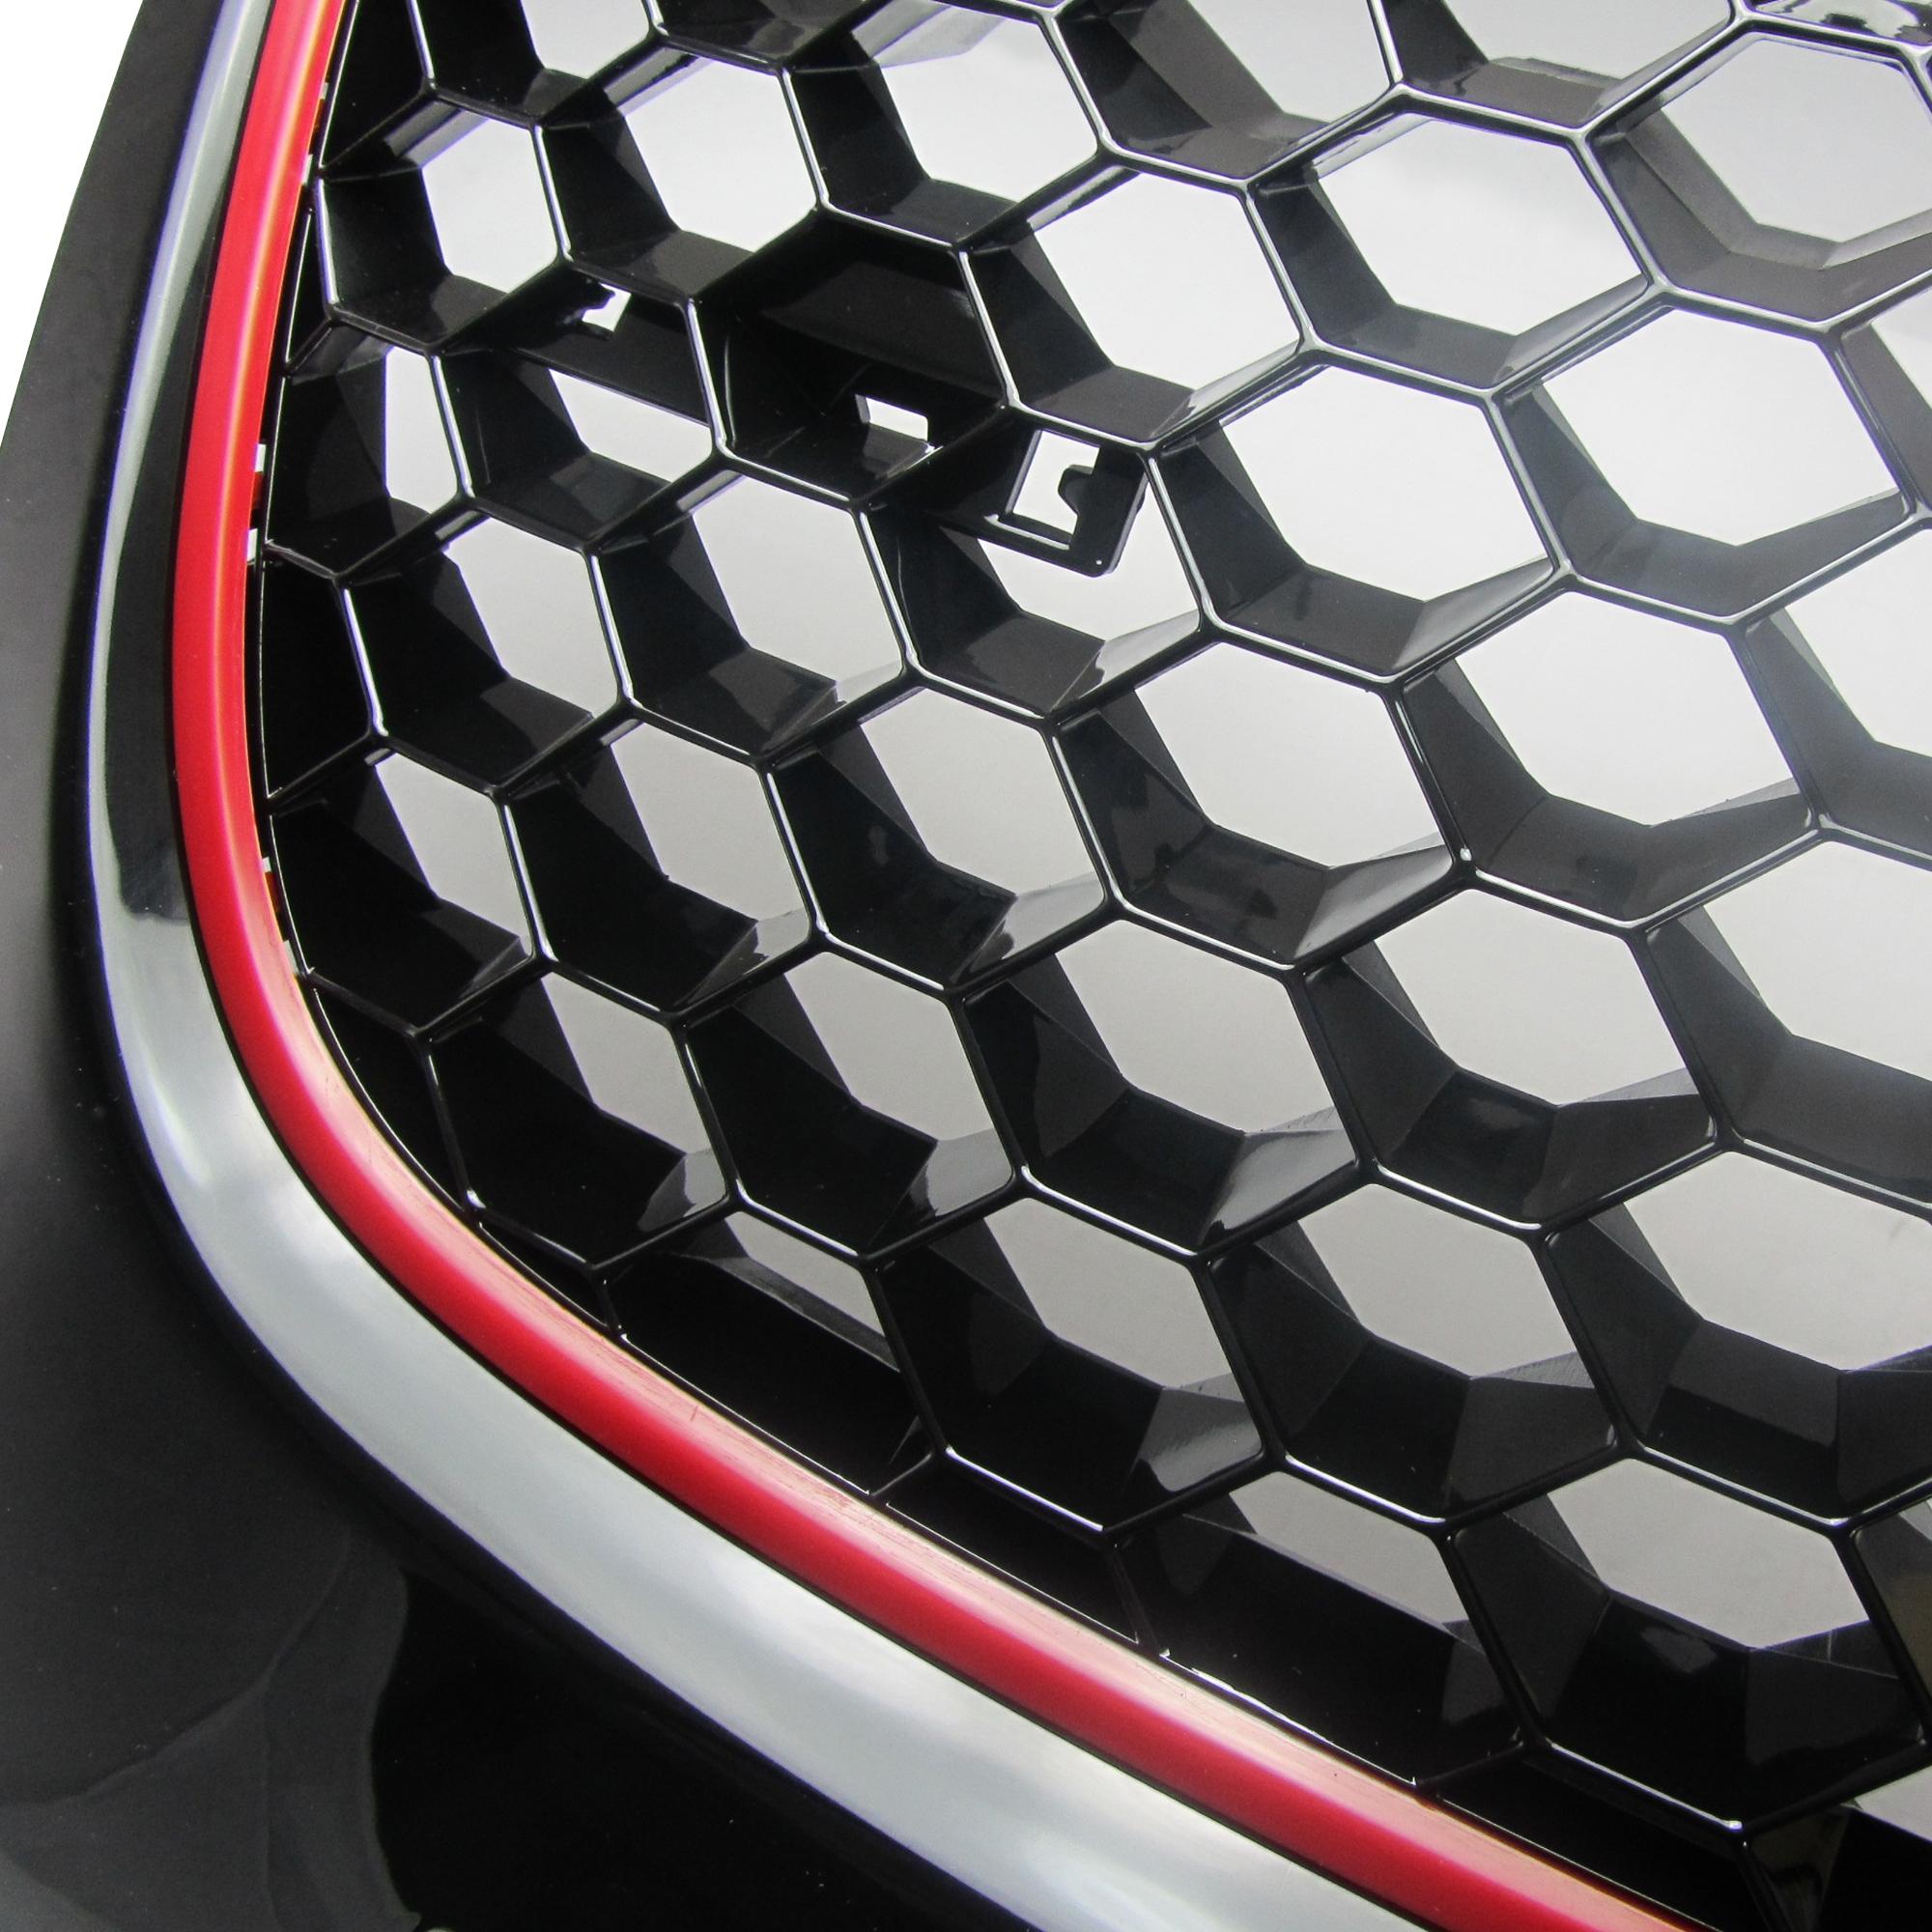 calandre jom vw golf 5 look gti grille nid d 39 abeille noir avec lis r rouge sans sigle. Black Bedroom Furniture Sets. Home Design Ideas